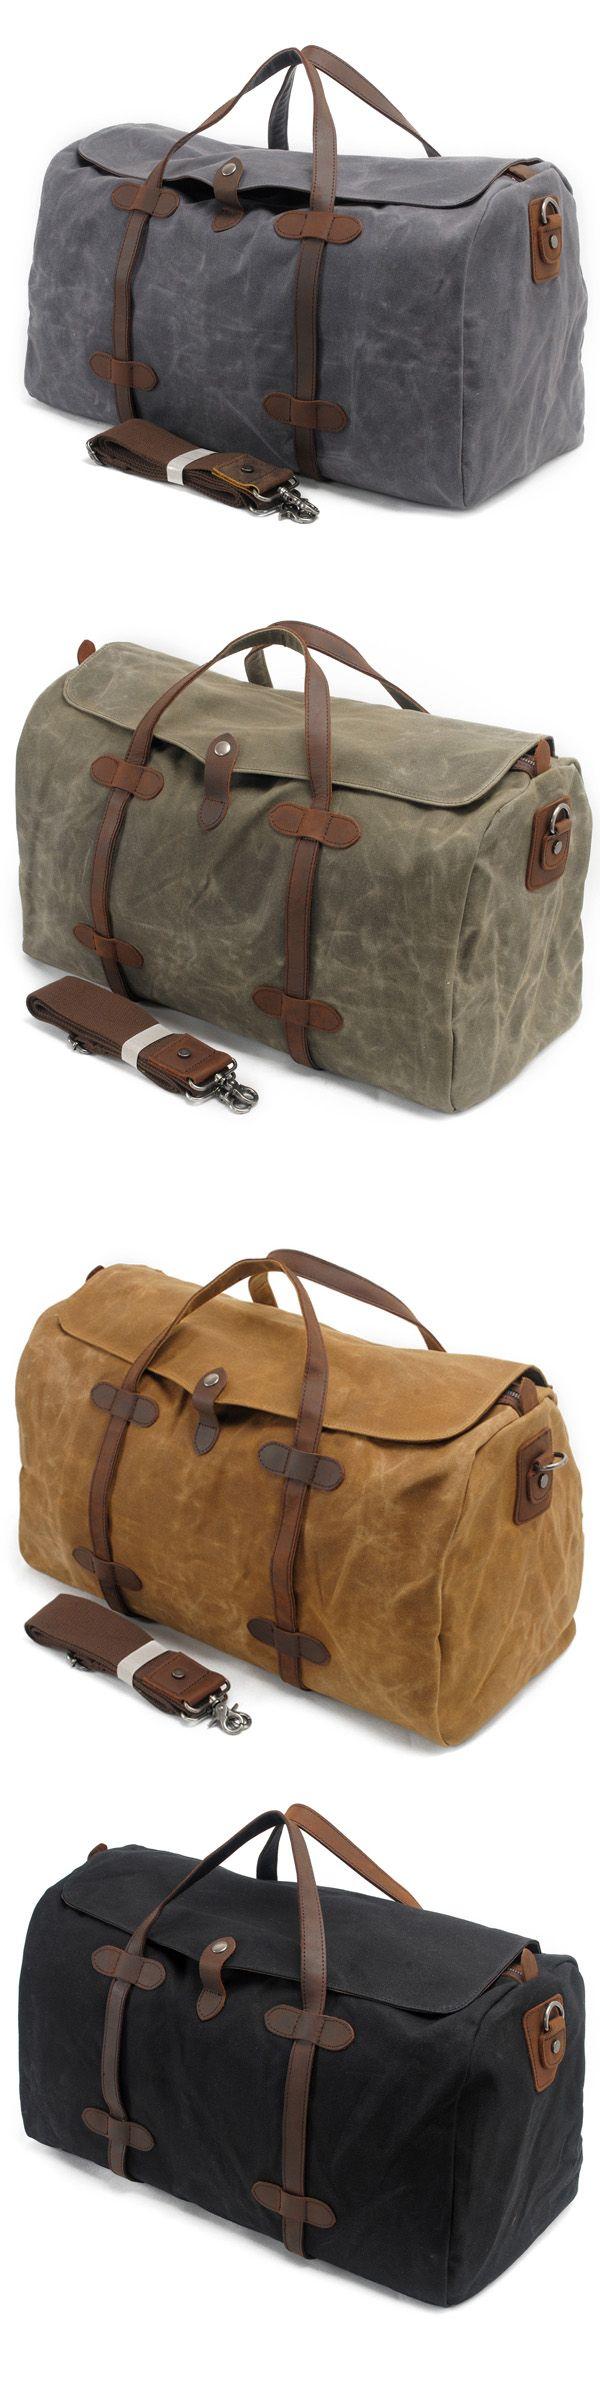 [46%OFF] Batik Canvas Holdall Bag Big Capacity Bucket Bag Waterproof Crossbody Bag For Men